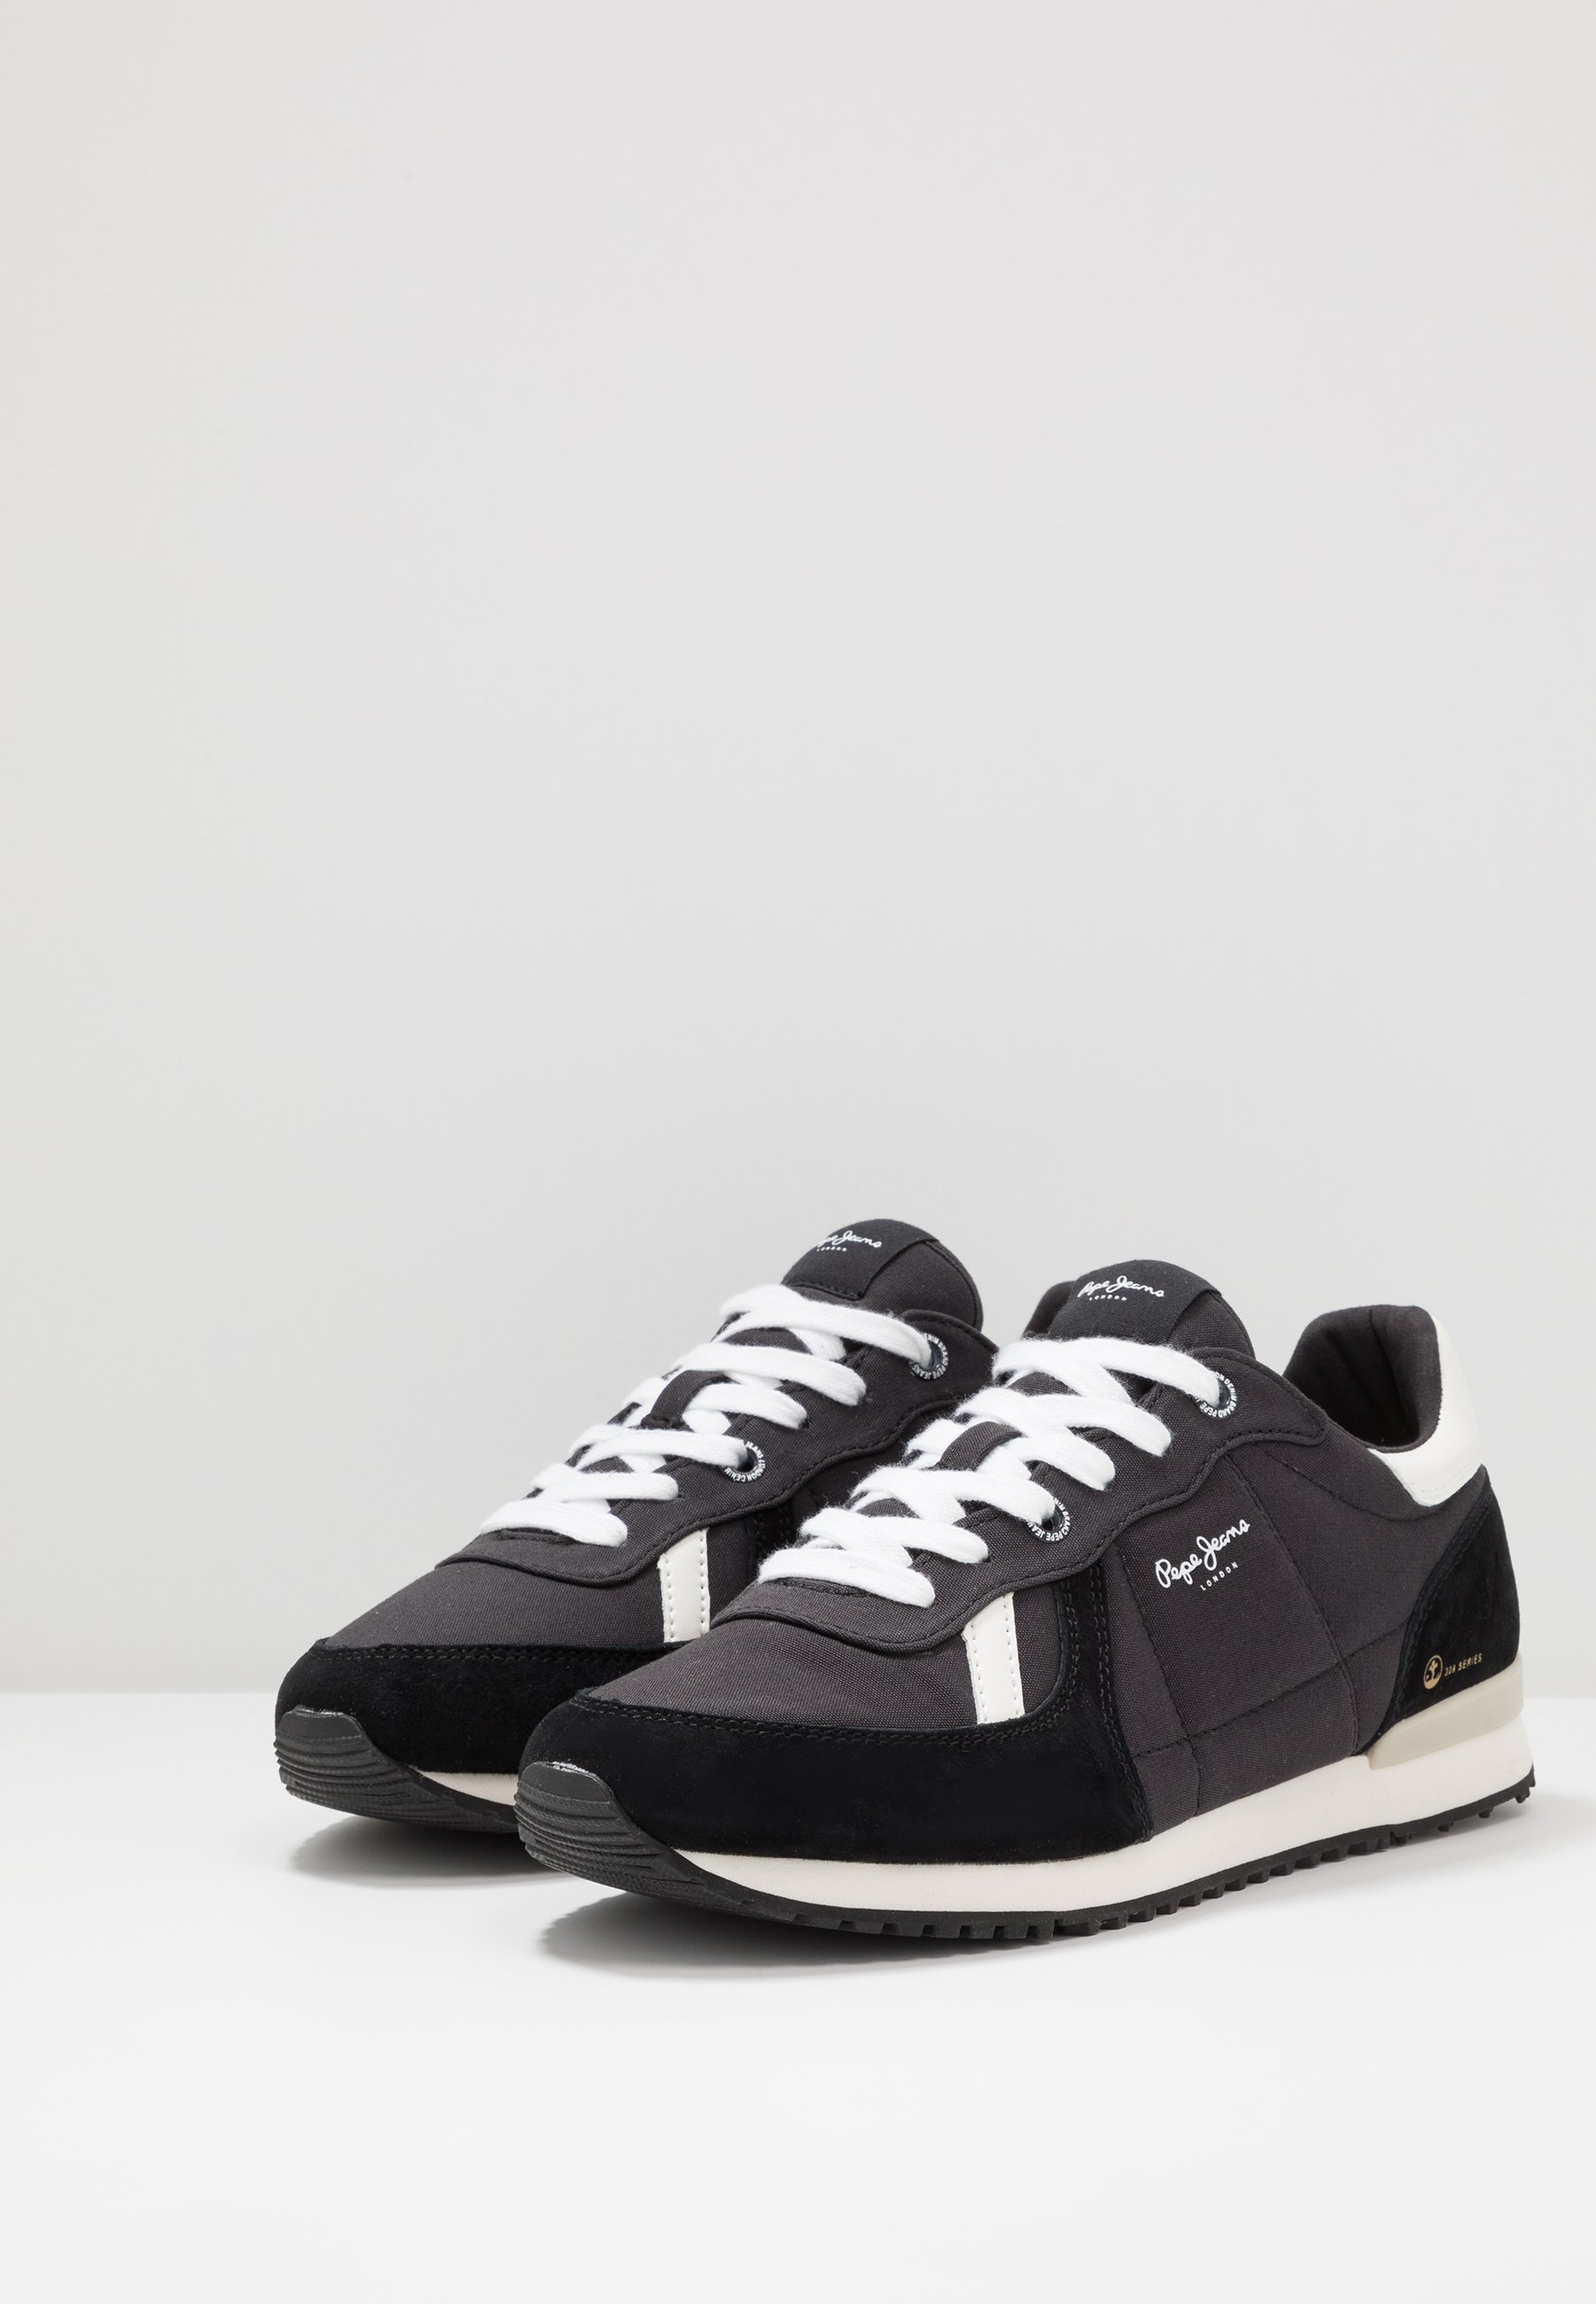 Pepe Jeans TINKER JOGGER - Sneakers basse - black | Scarpe Prezzo Speciale